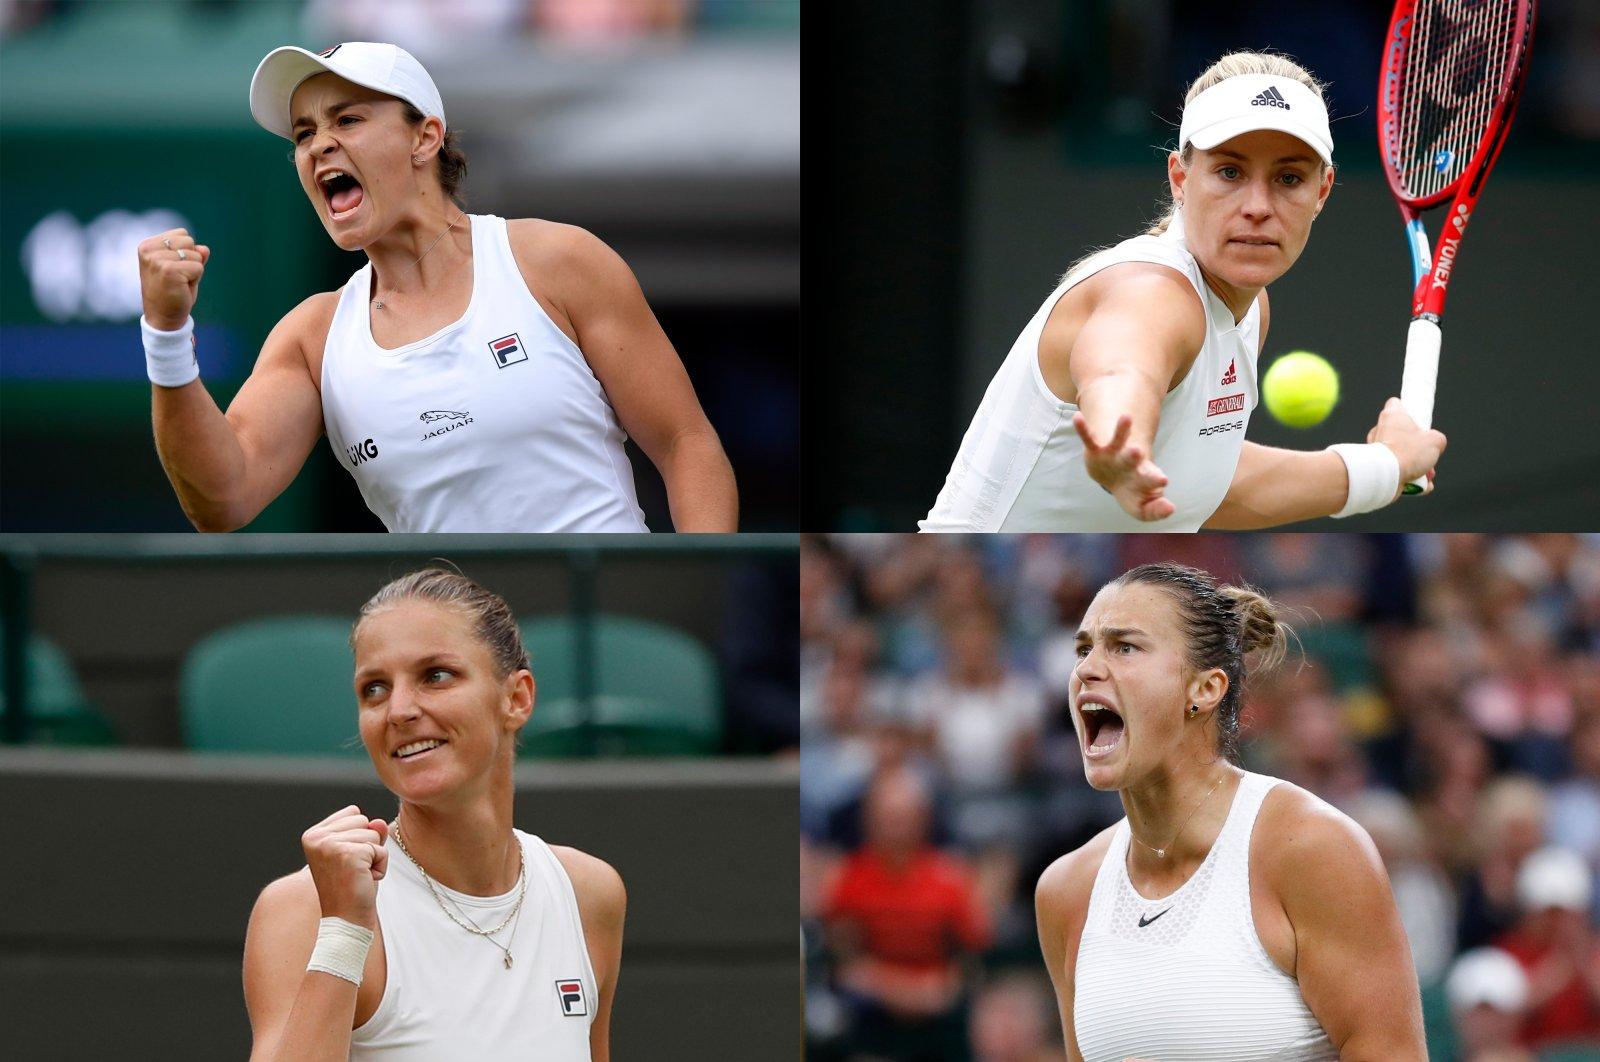 This combination photo shows the four semifinalists of the Wimbledon Tennis Championships – Ash Barty (top left), Angelique Kerber (top right), Karolina Pliskova (bottom left) and Aryna Sabalenka. (Reuters Photos)